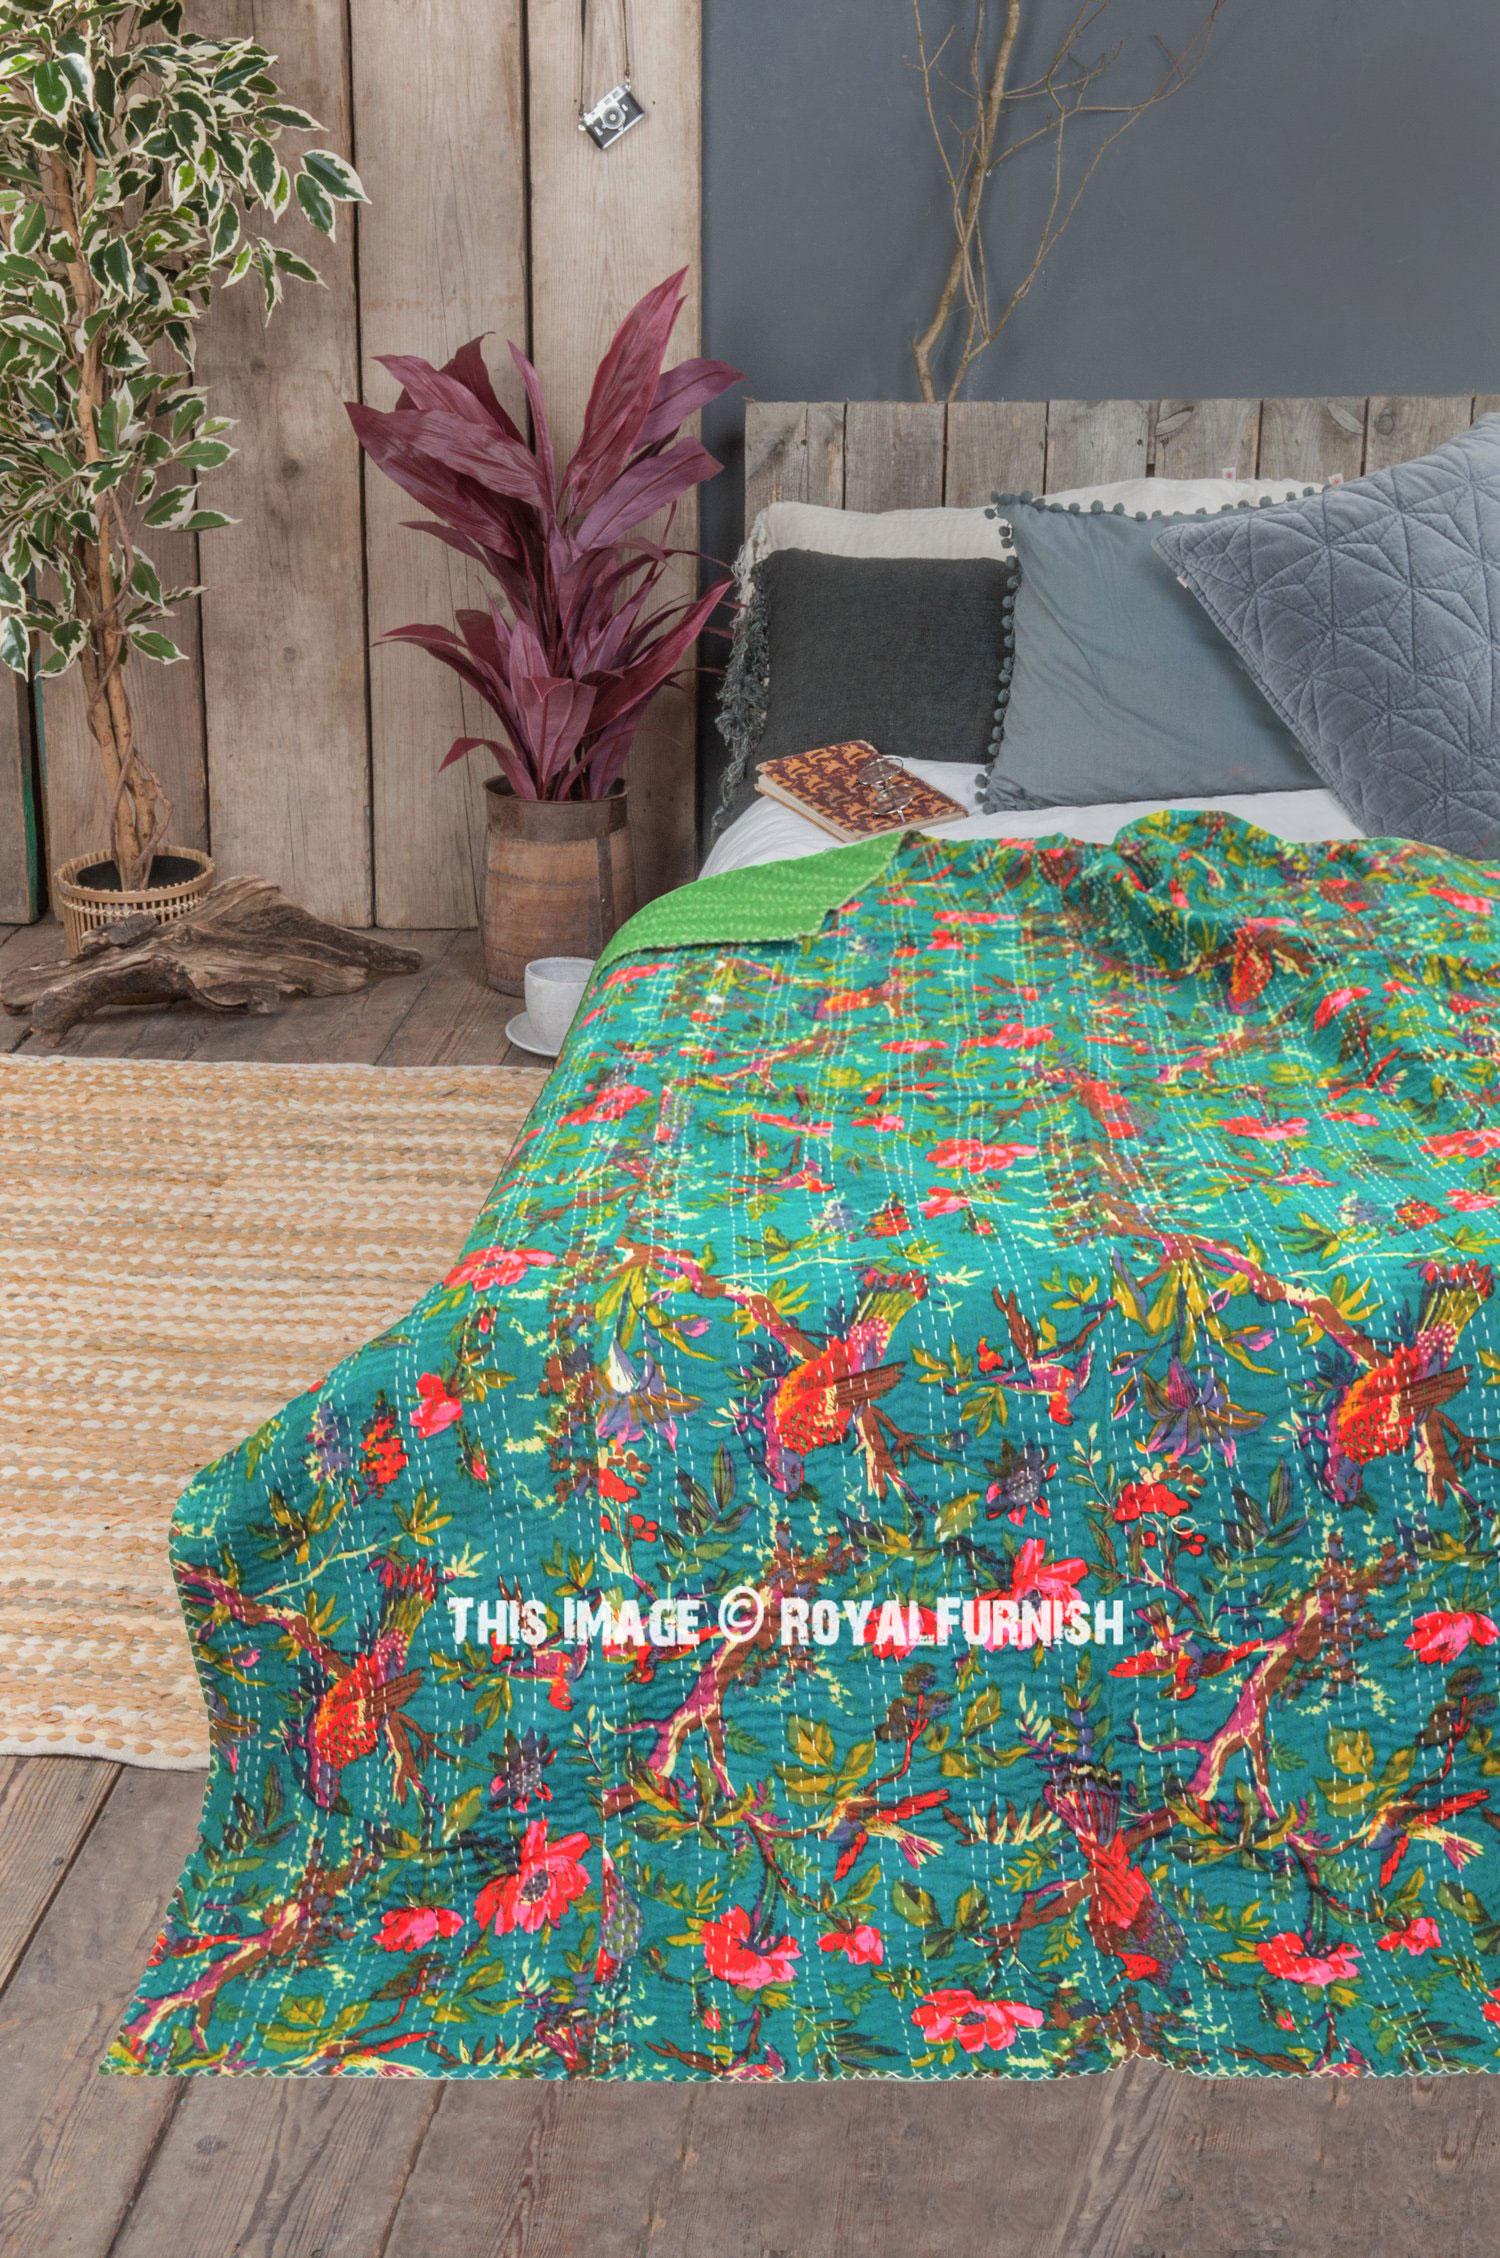 Green Bird Paradise Kantha Quilt Floral Bedspread Blanket Bed Cover